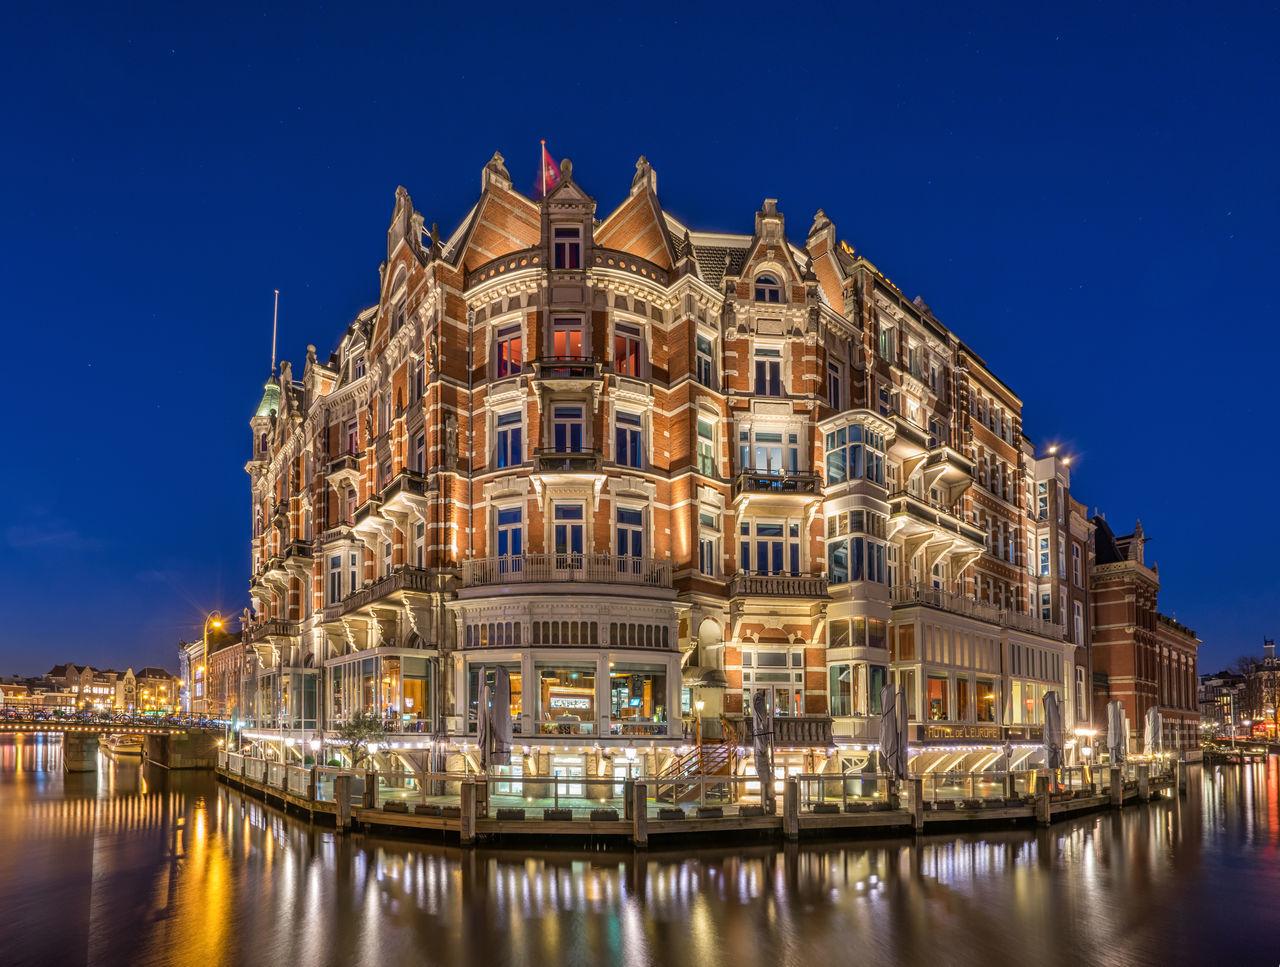 Beautiful stock photos of amsterdam, illuminated, night, architecture, travel destinations